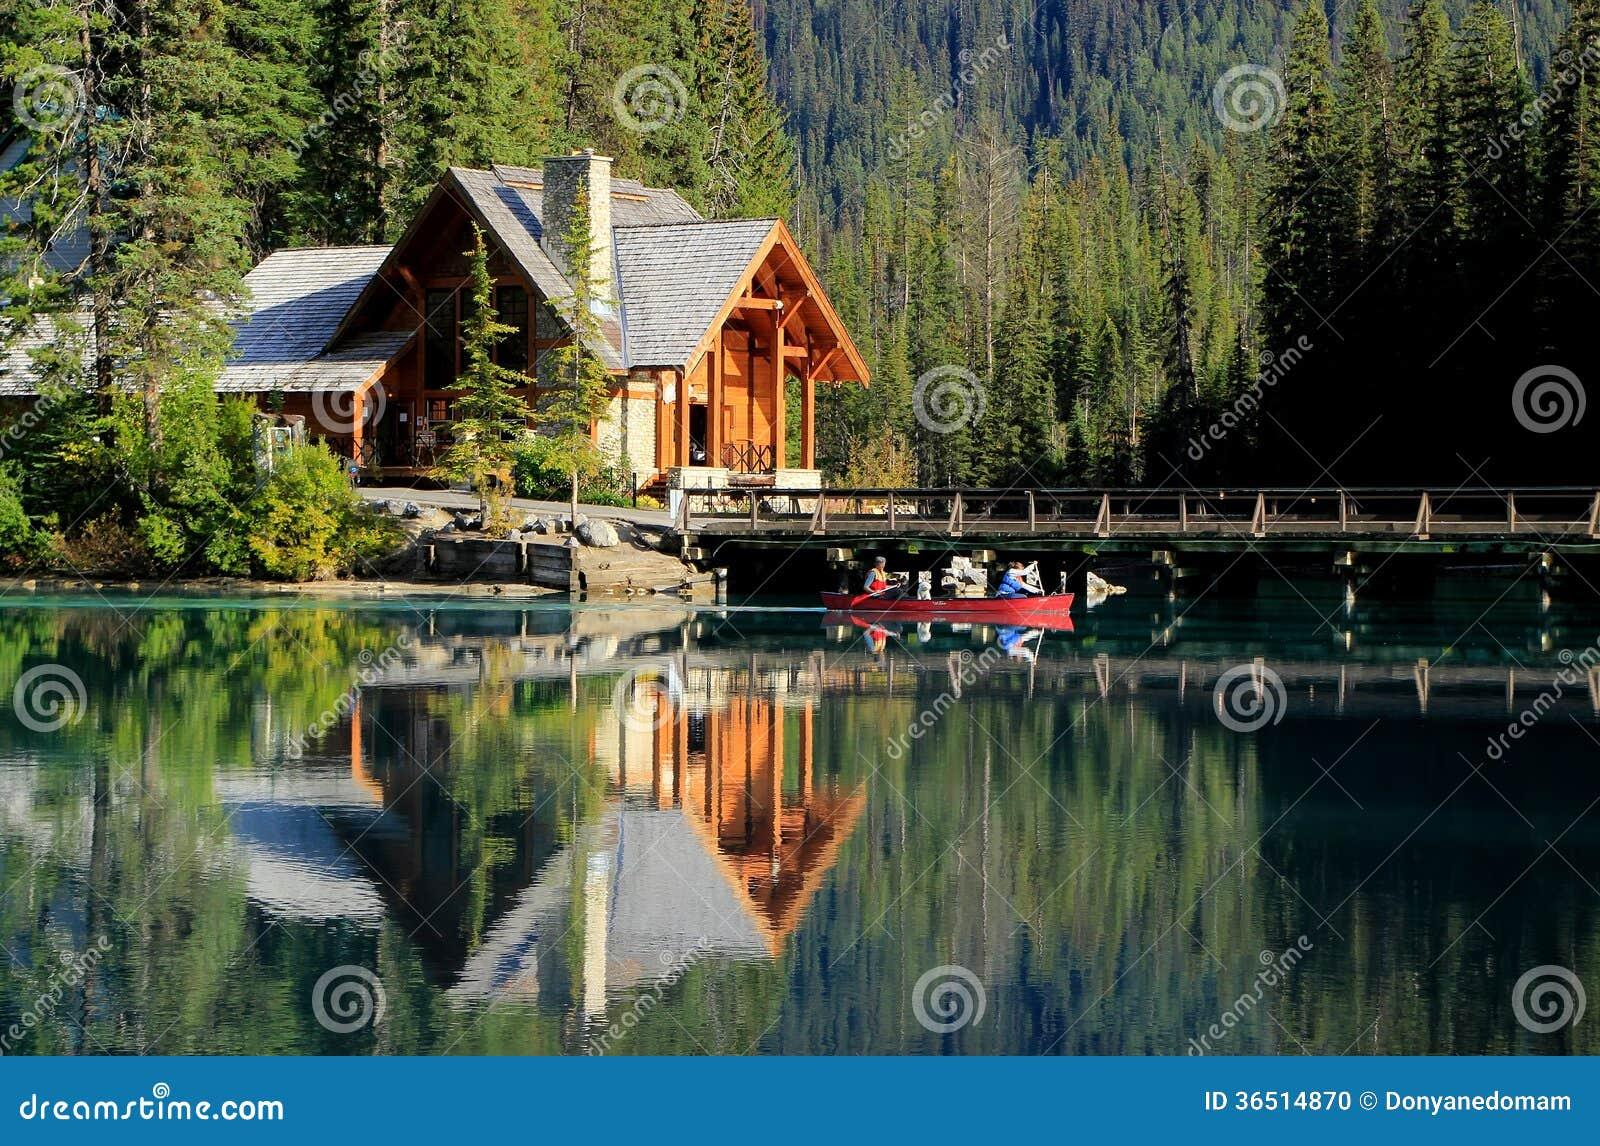 Maison En Bois Chez Emerald Lake Yoho National Park Canada Photo Stock Image 36514870